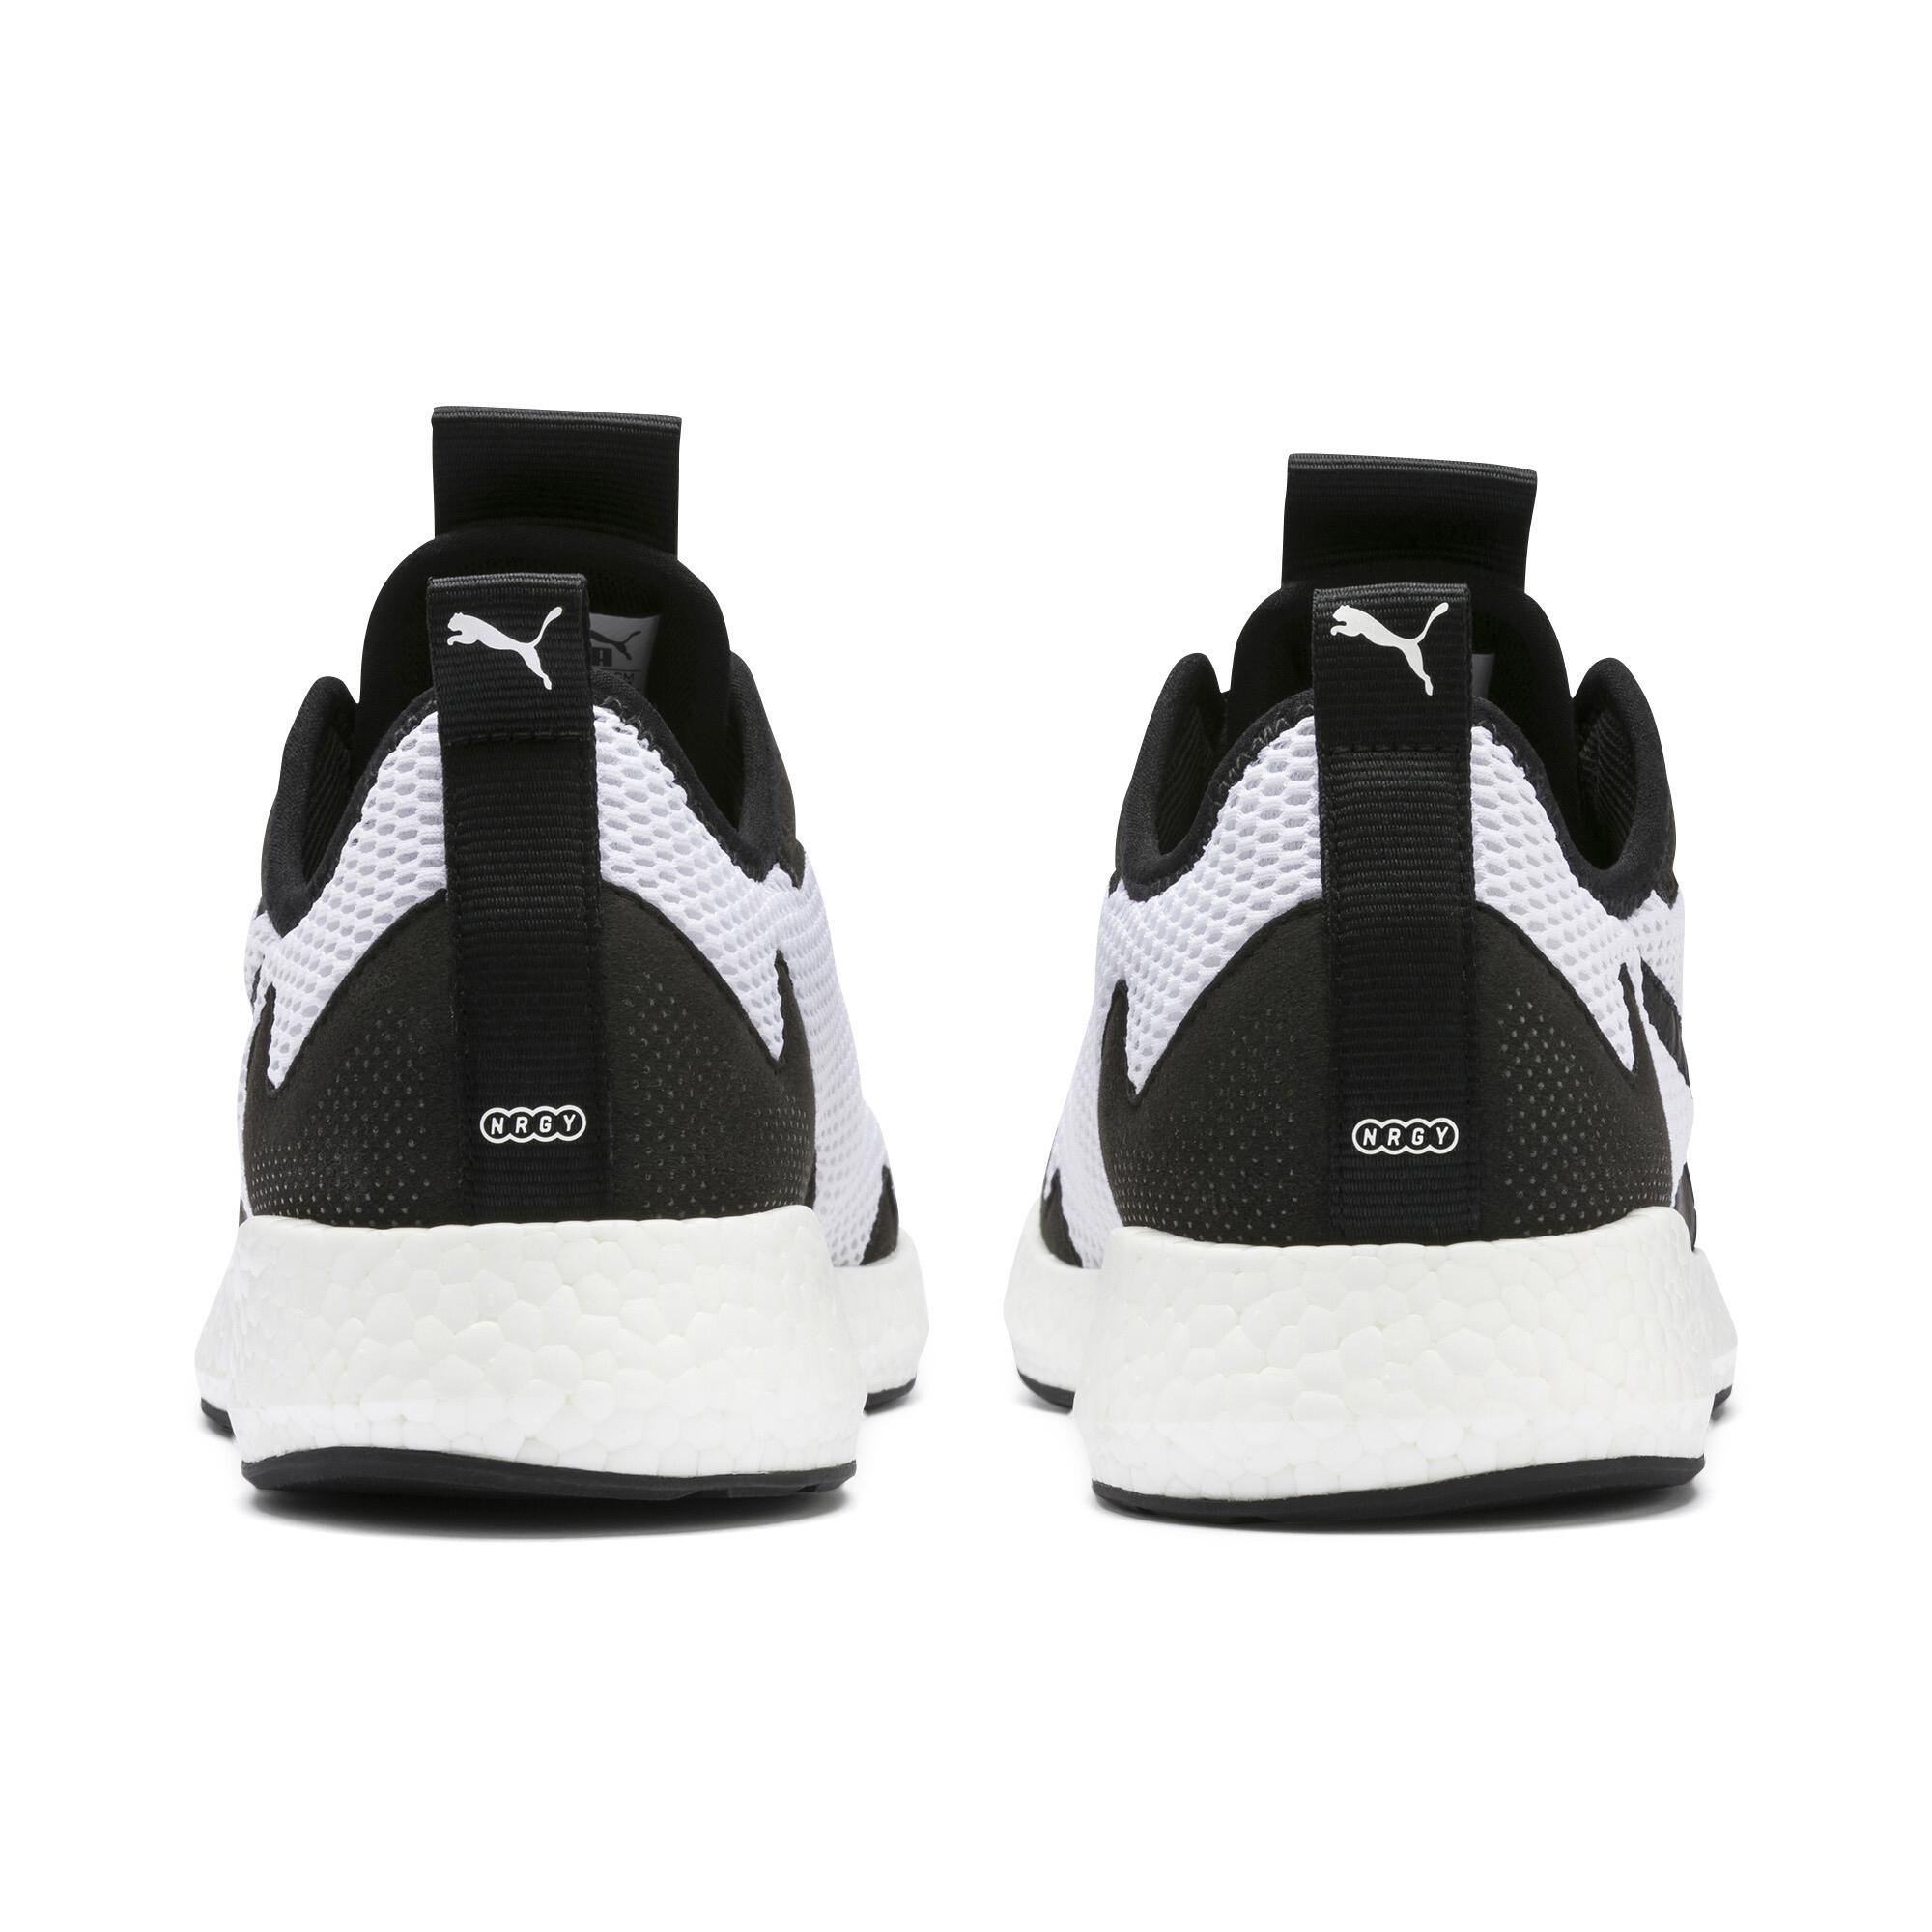 PUMA-NRGY-Neko-Skim-Men-s-Running-Shoes-Men-Shoe-Running thumbnail 18